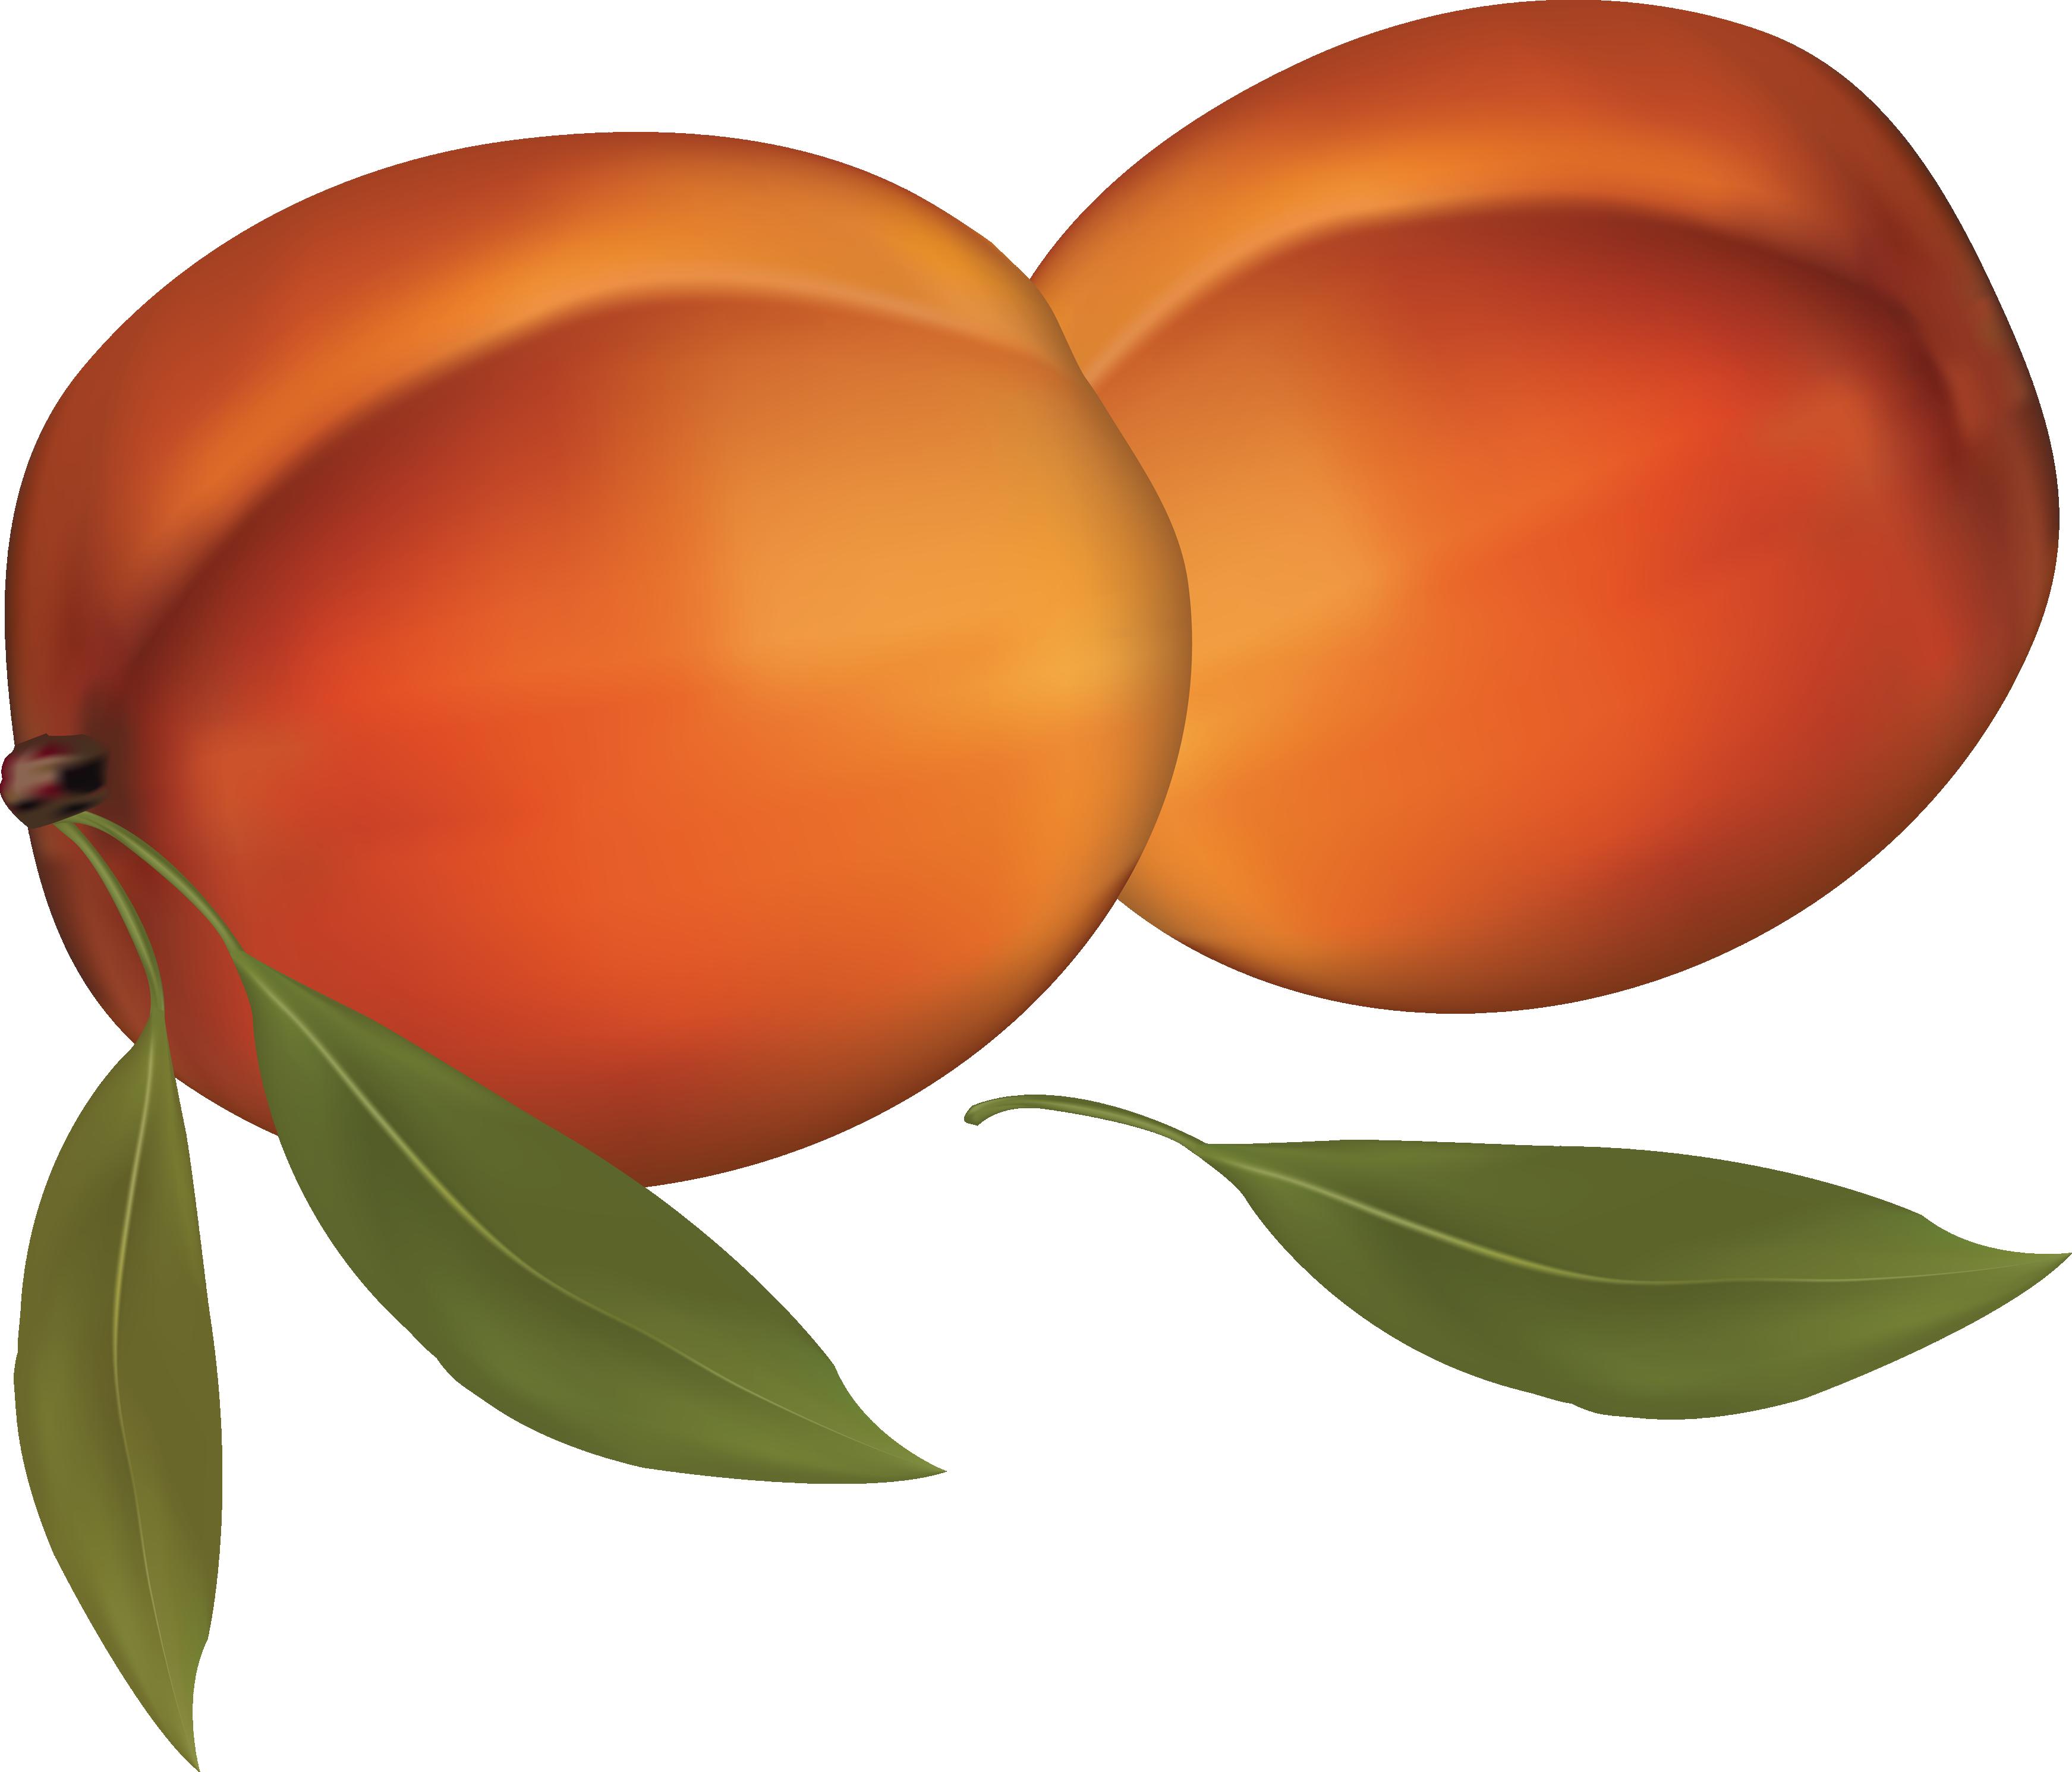 Pear clipart peach. Jokingart com download free